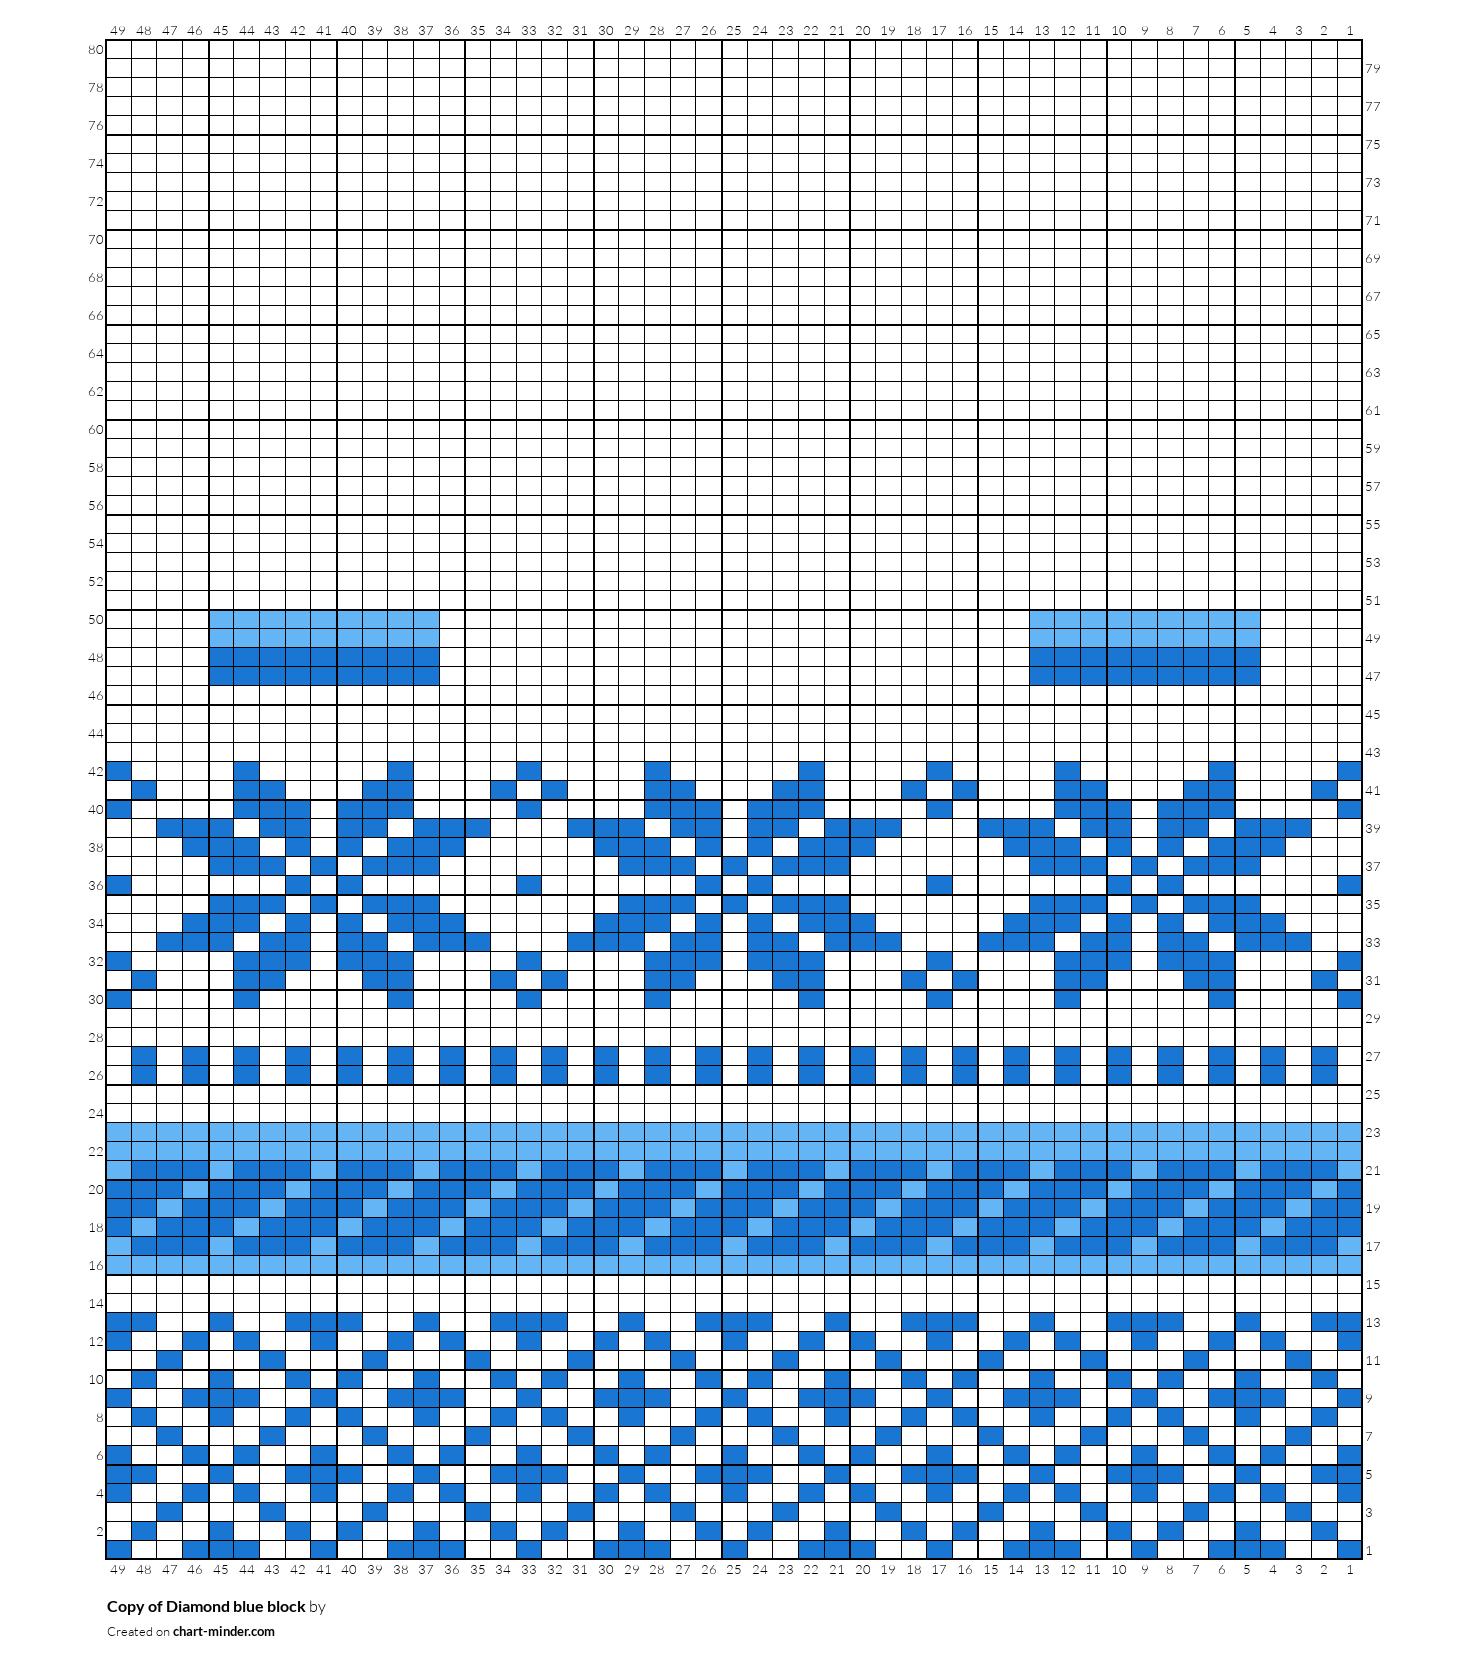 Copy of Diamond blue block